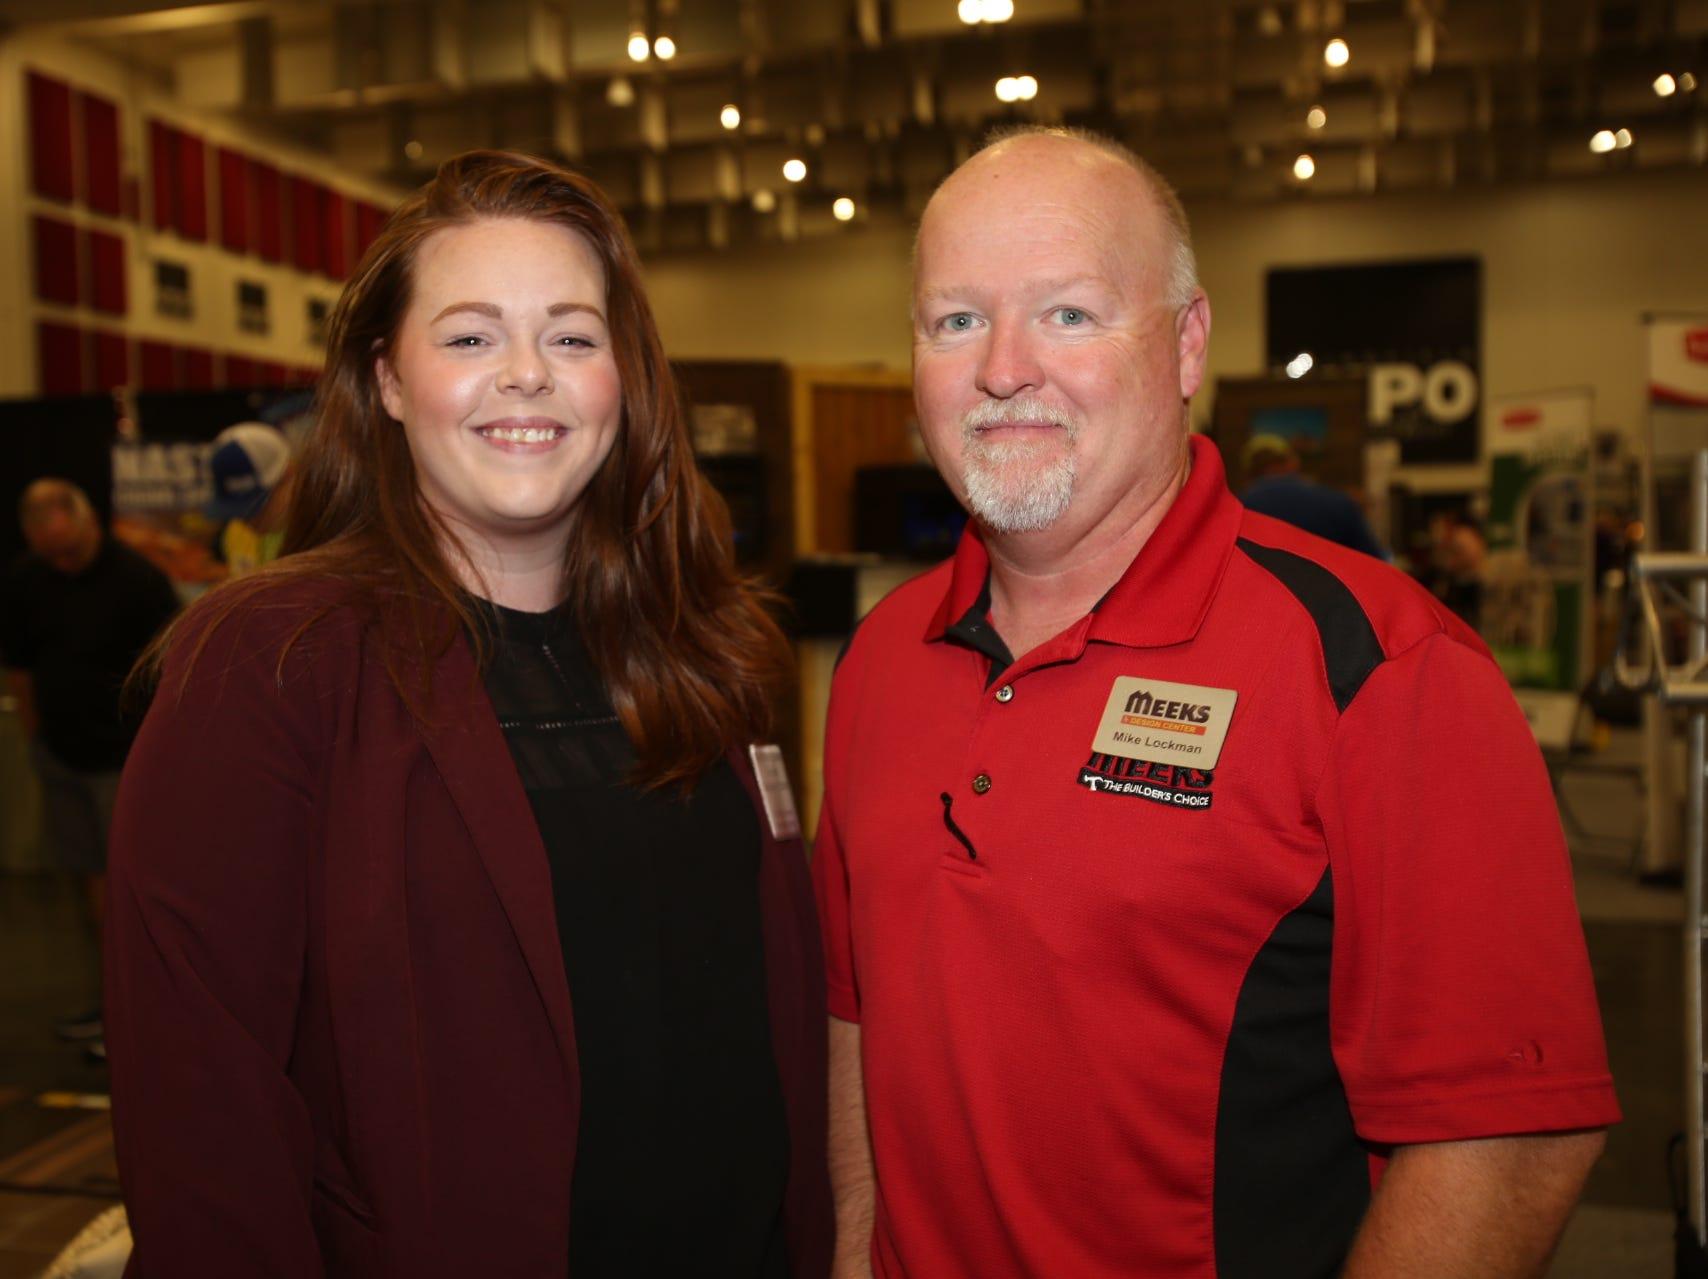 Stephanie Tibbetts and Mike Lockman